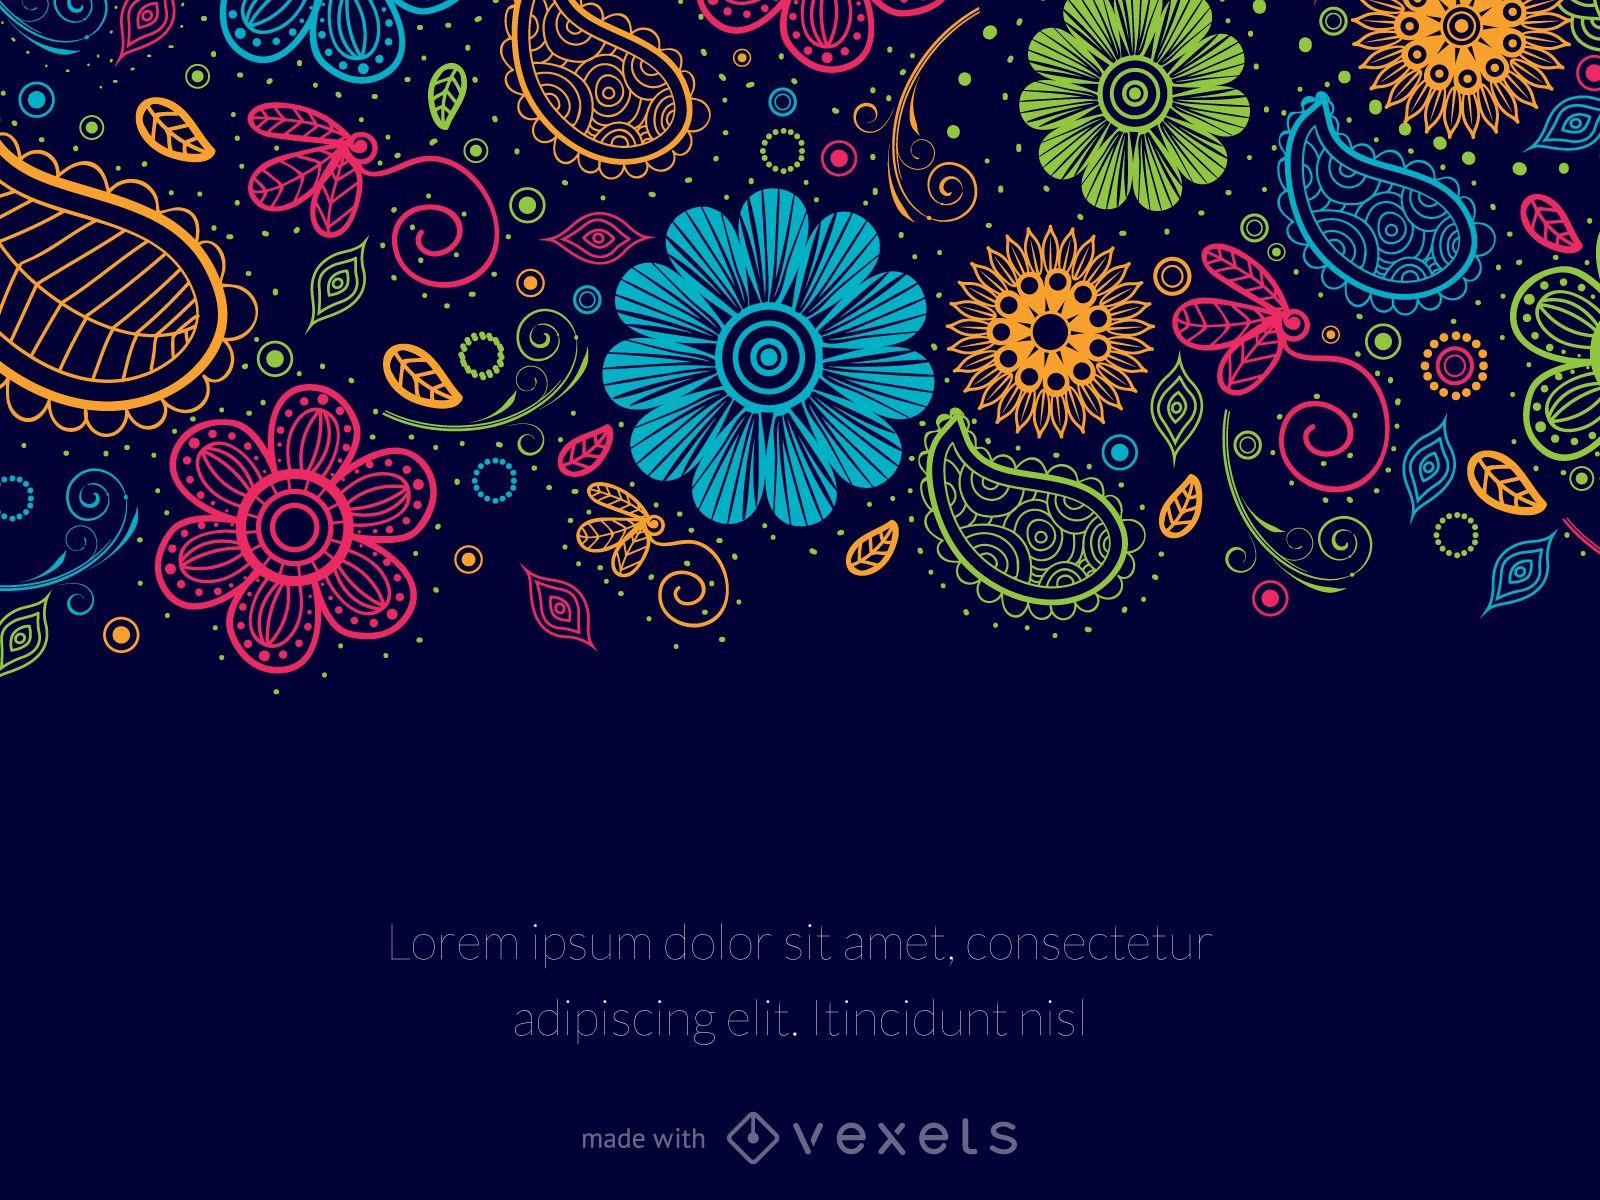 Paisley Floral Message Editor Editable Design